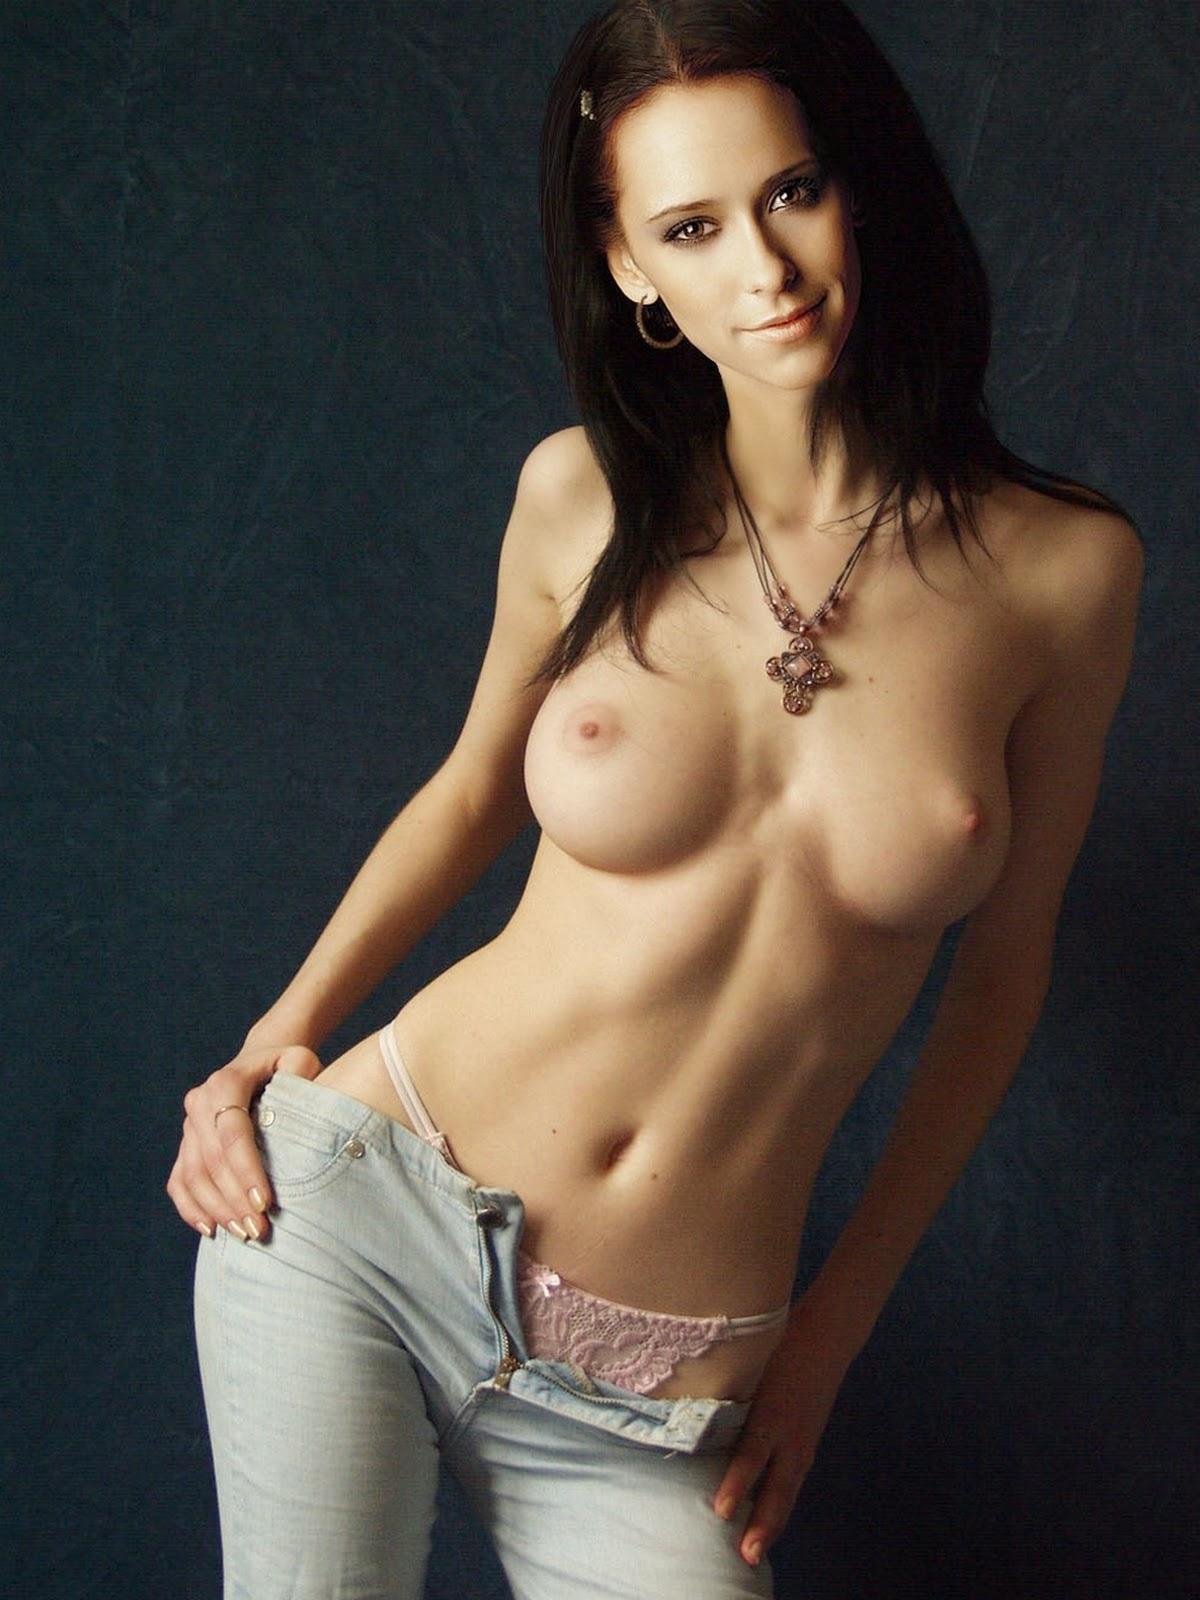 sexy spanish women in tight shorts